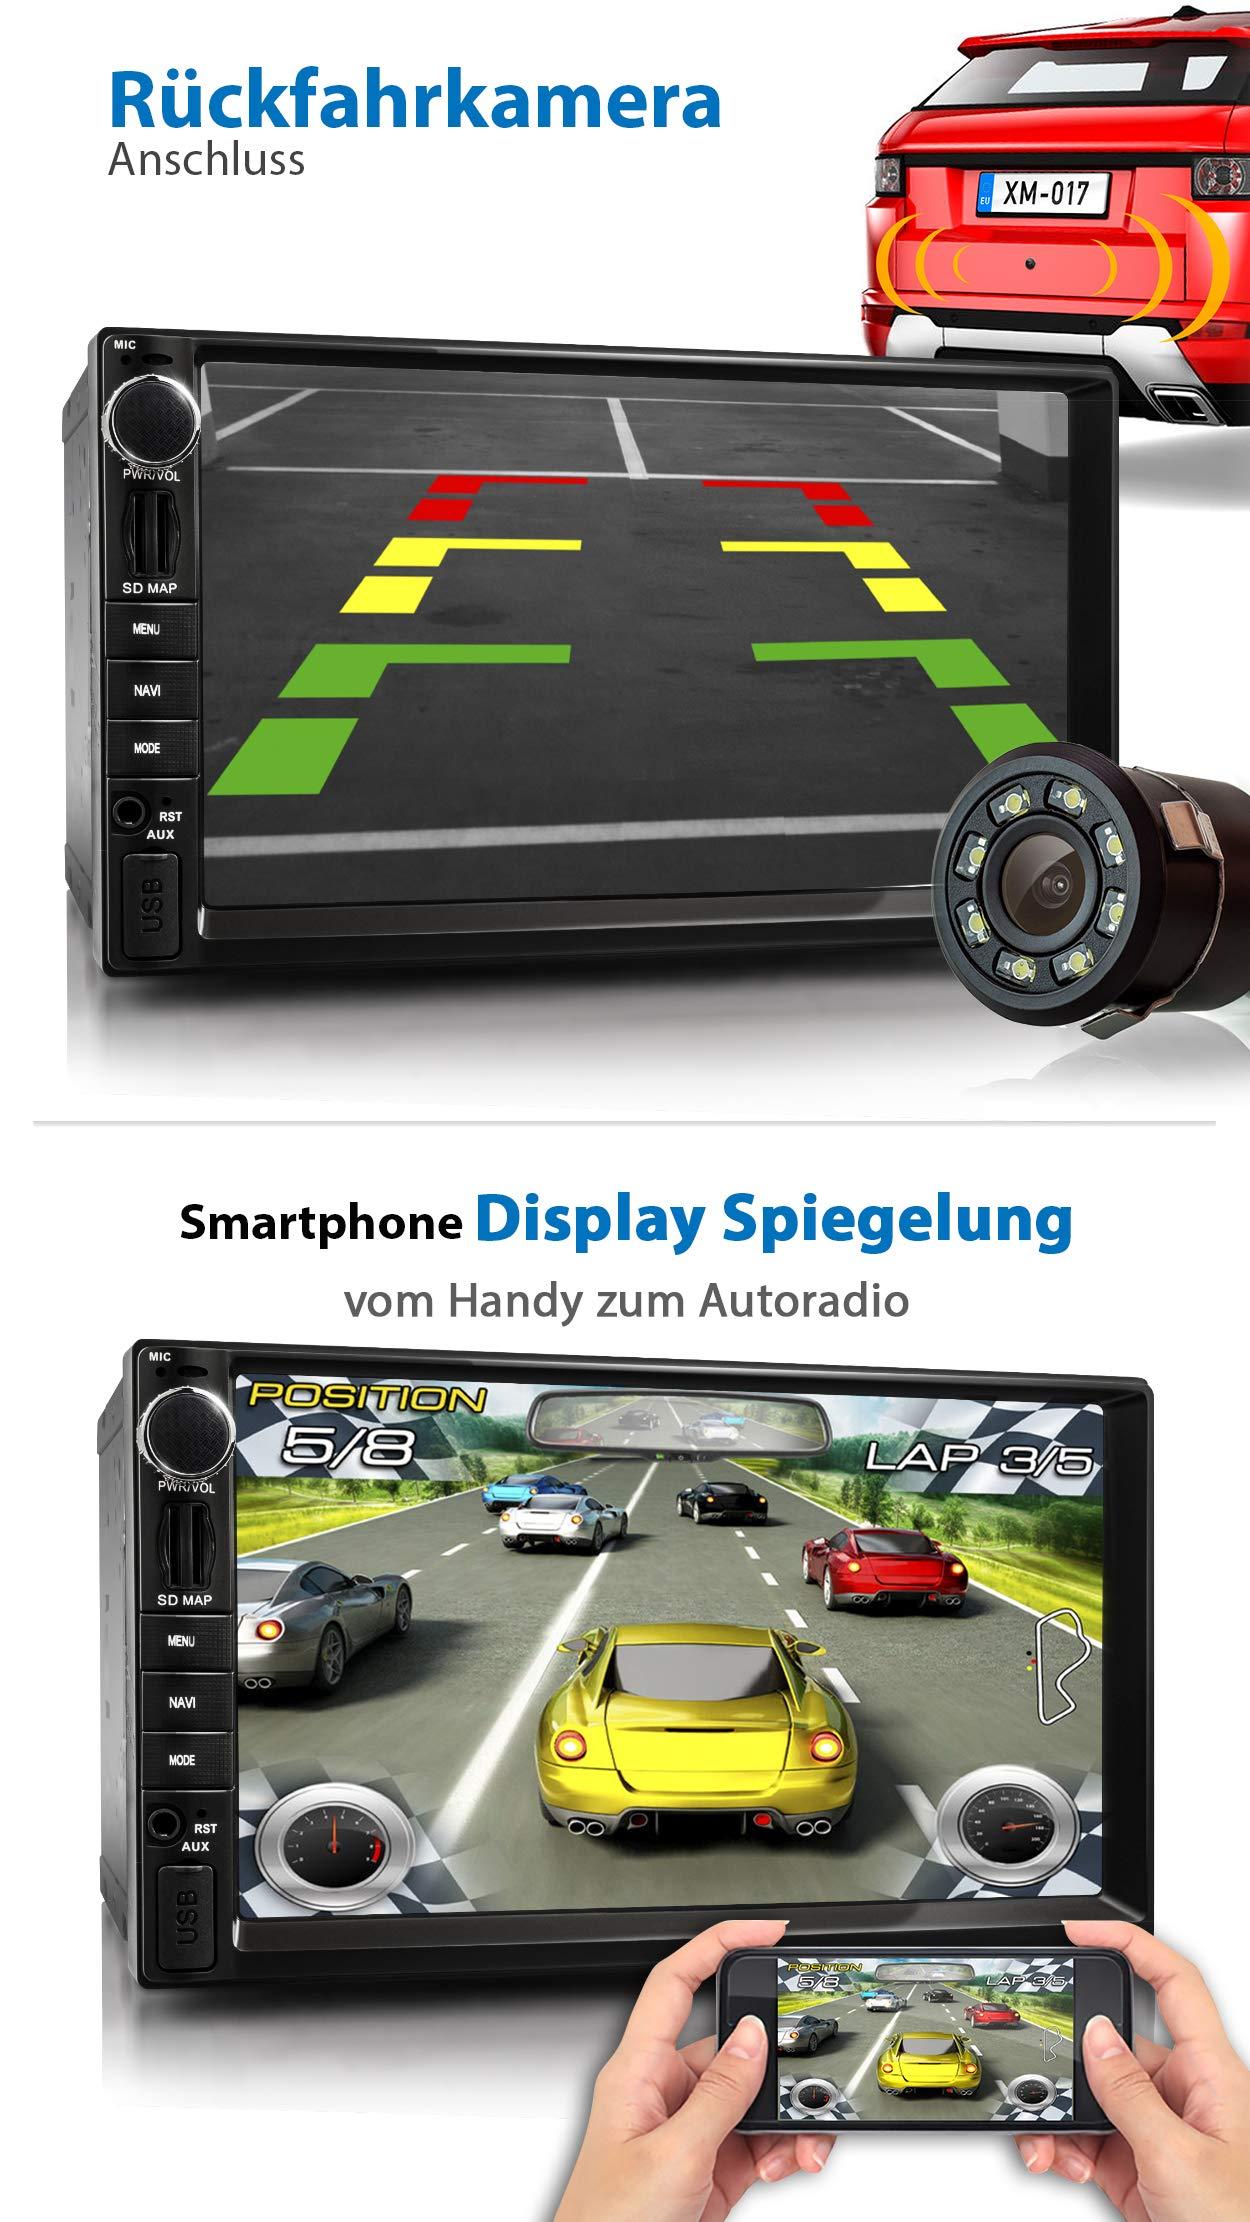 XOMAX-XM-2VA757-Autoradio-mit-Android-9-QuadCore-2GB-RAM-32GB-ROM-GPS-Navigation-I-Support-WiFi-WLAN-3G-4G-DAB-OBD2-I-Bluetooth-7-Zoll-18-cm-Touchscreen-USB-SD-AUX-2-DIN